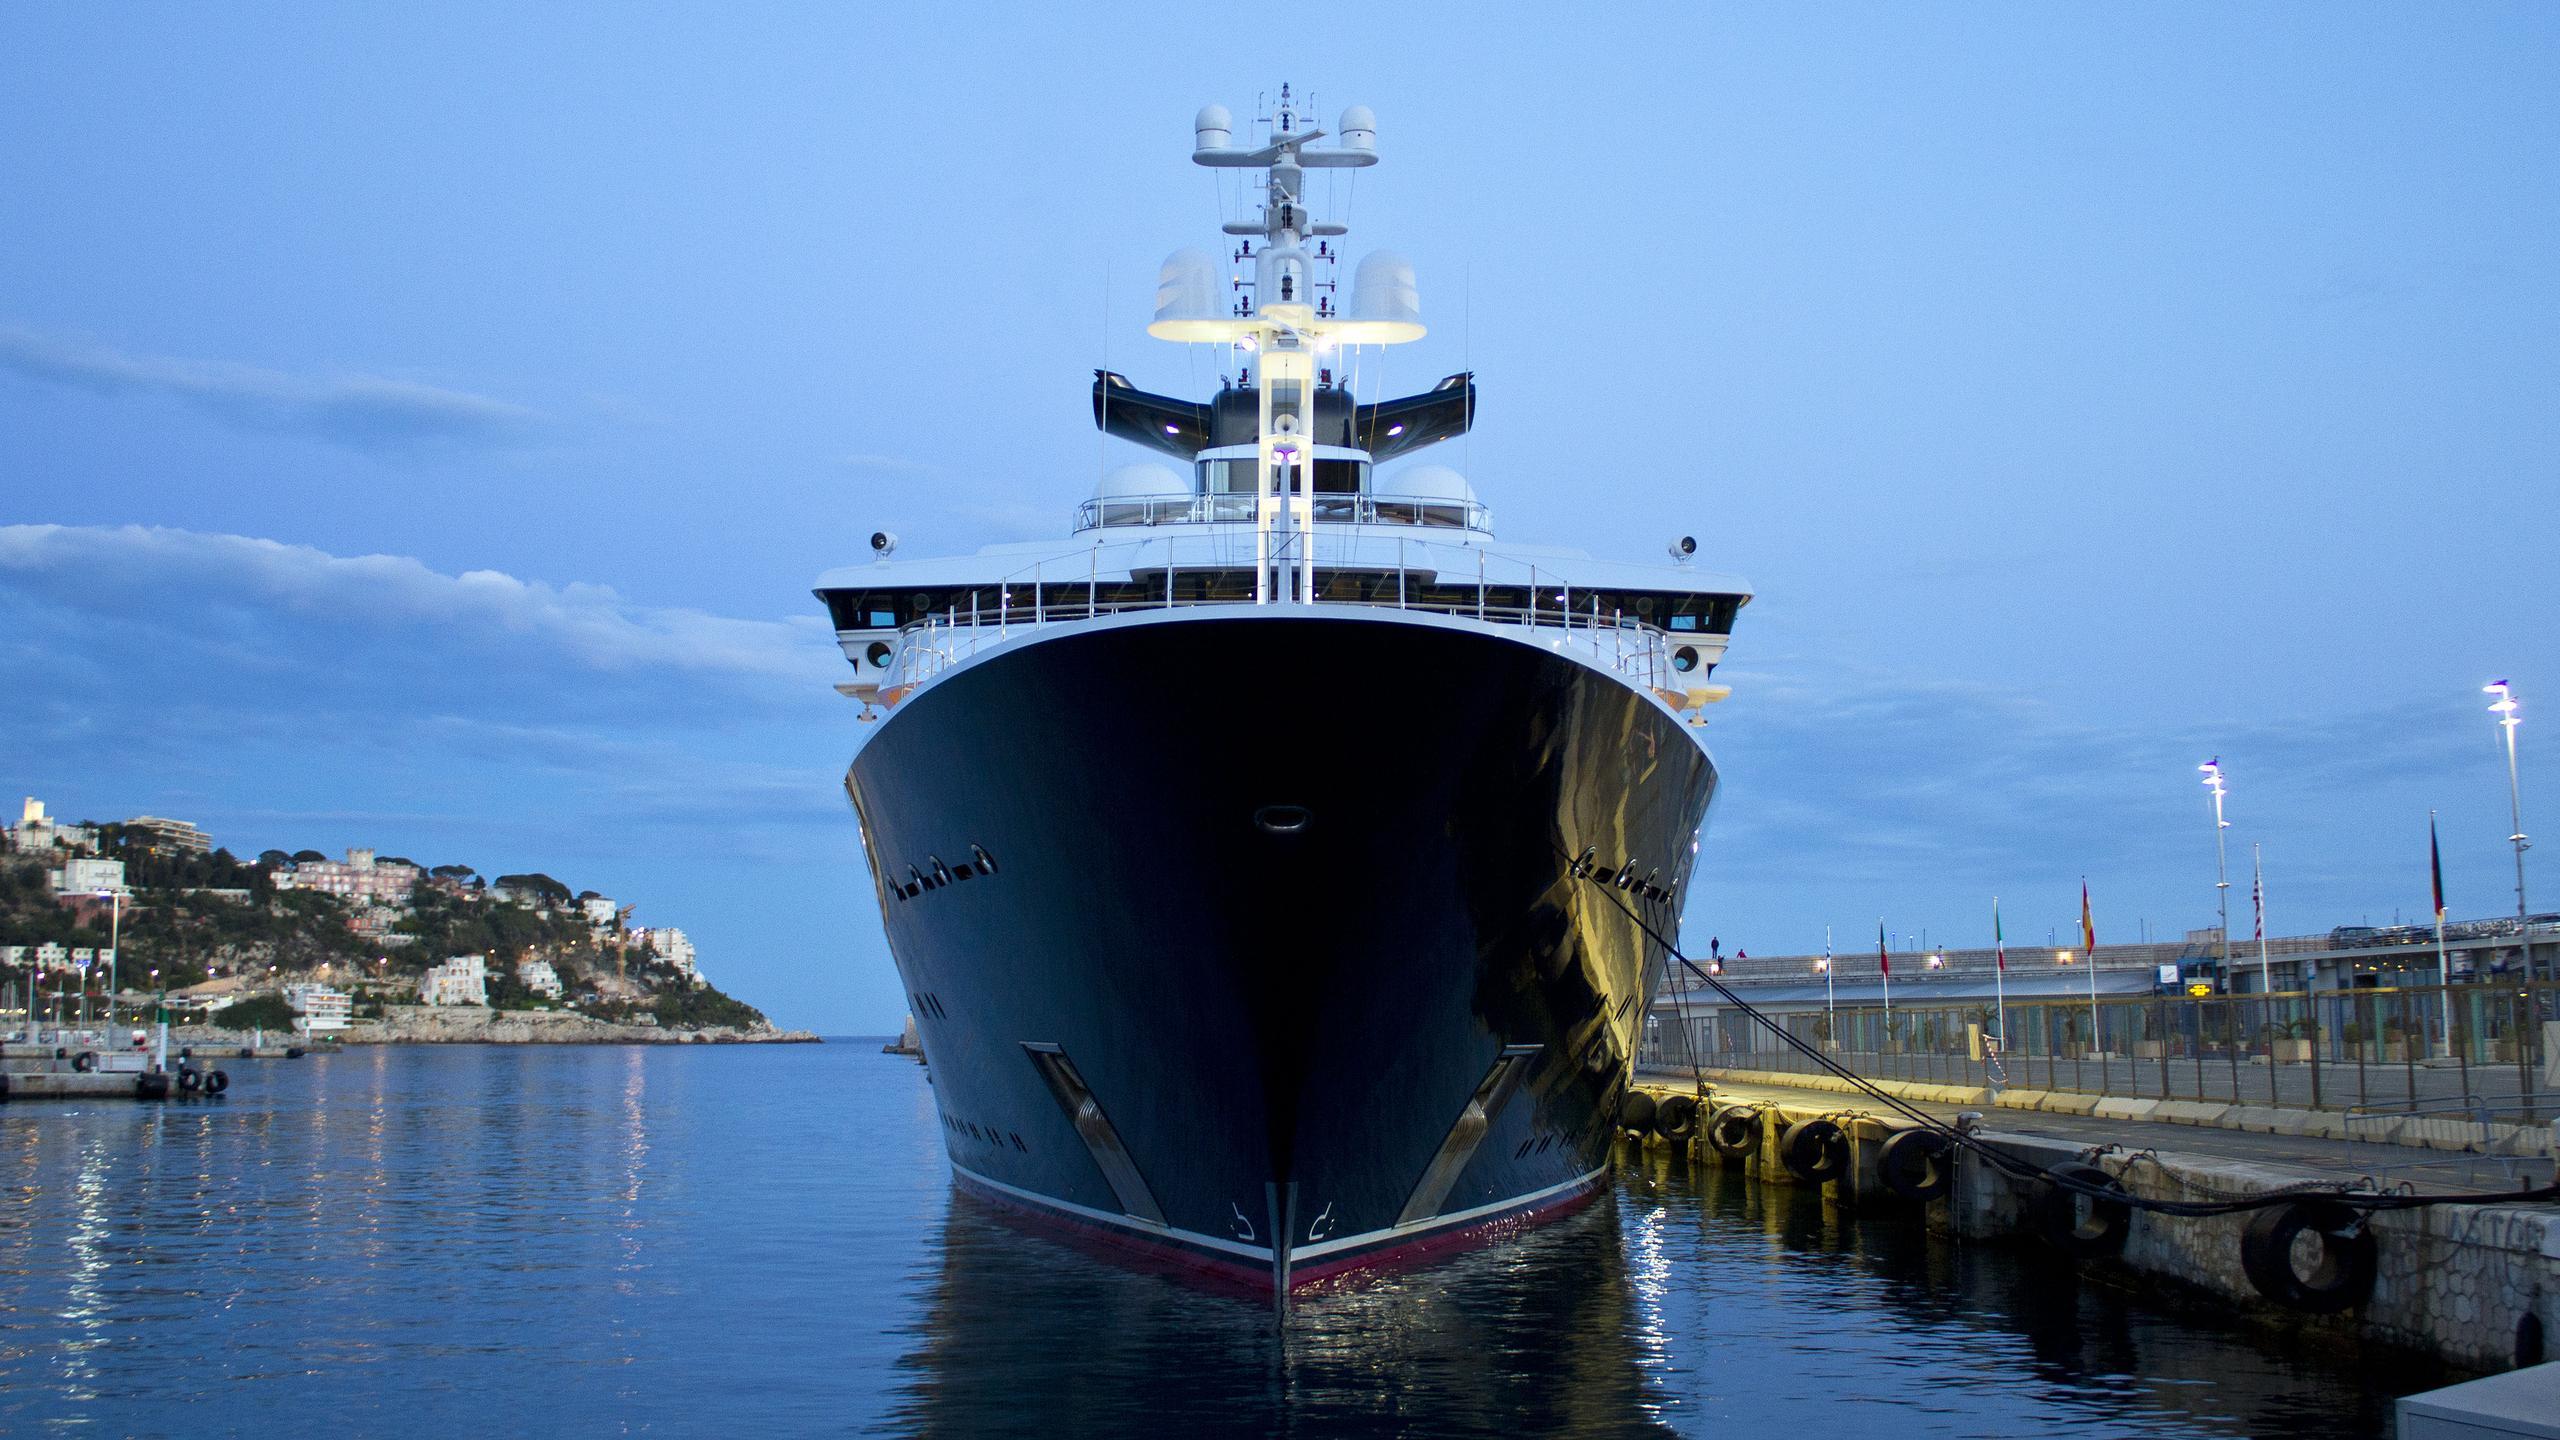 octopus-explorer-yacht-lurssen-2003-126m-bow